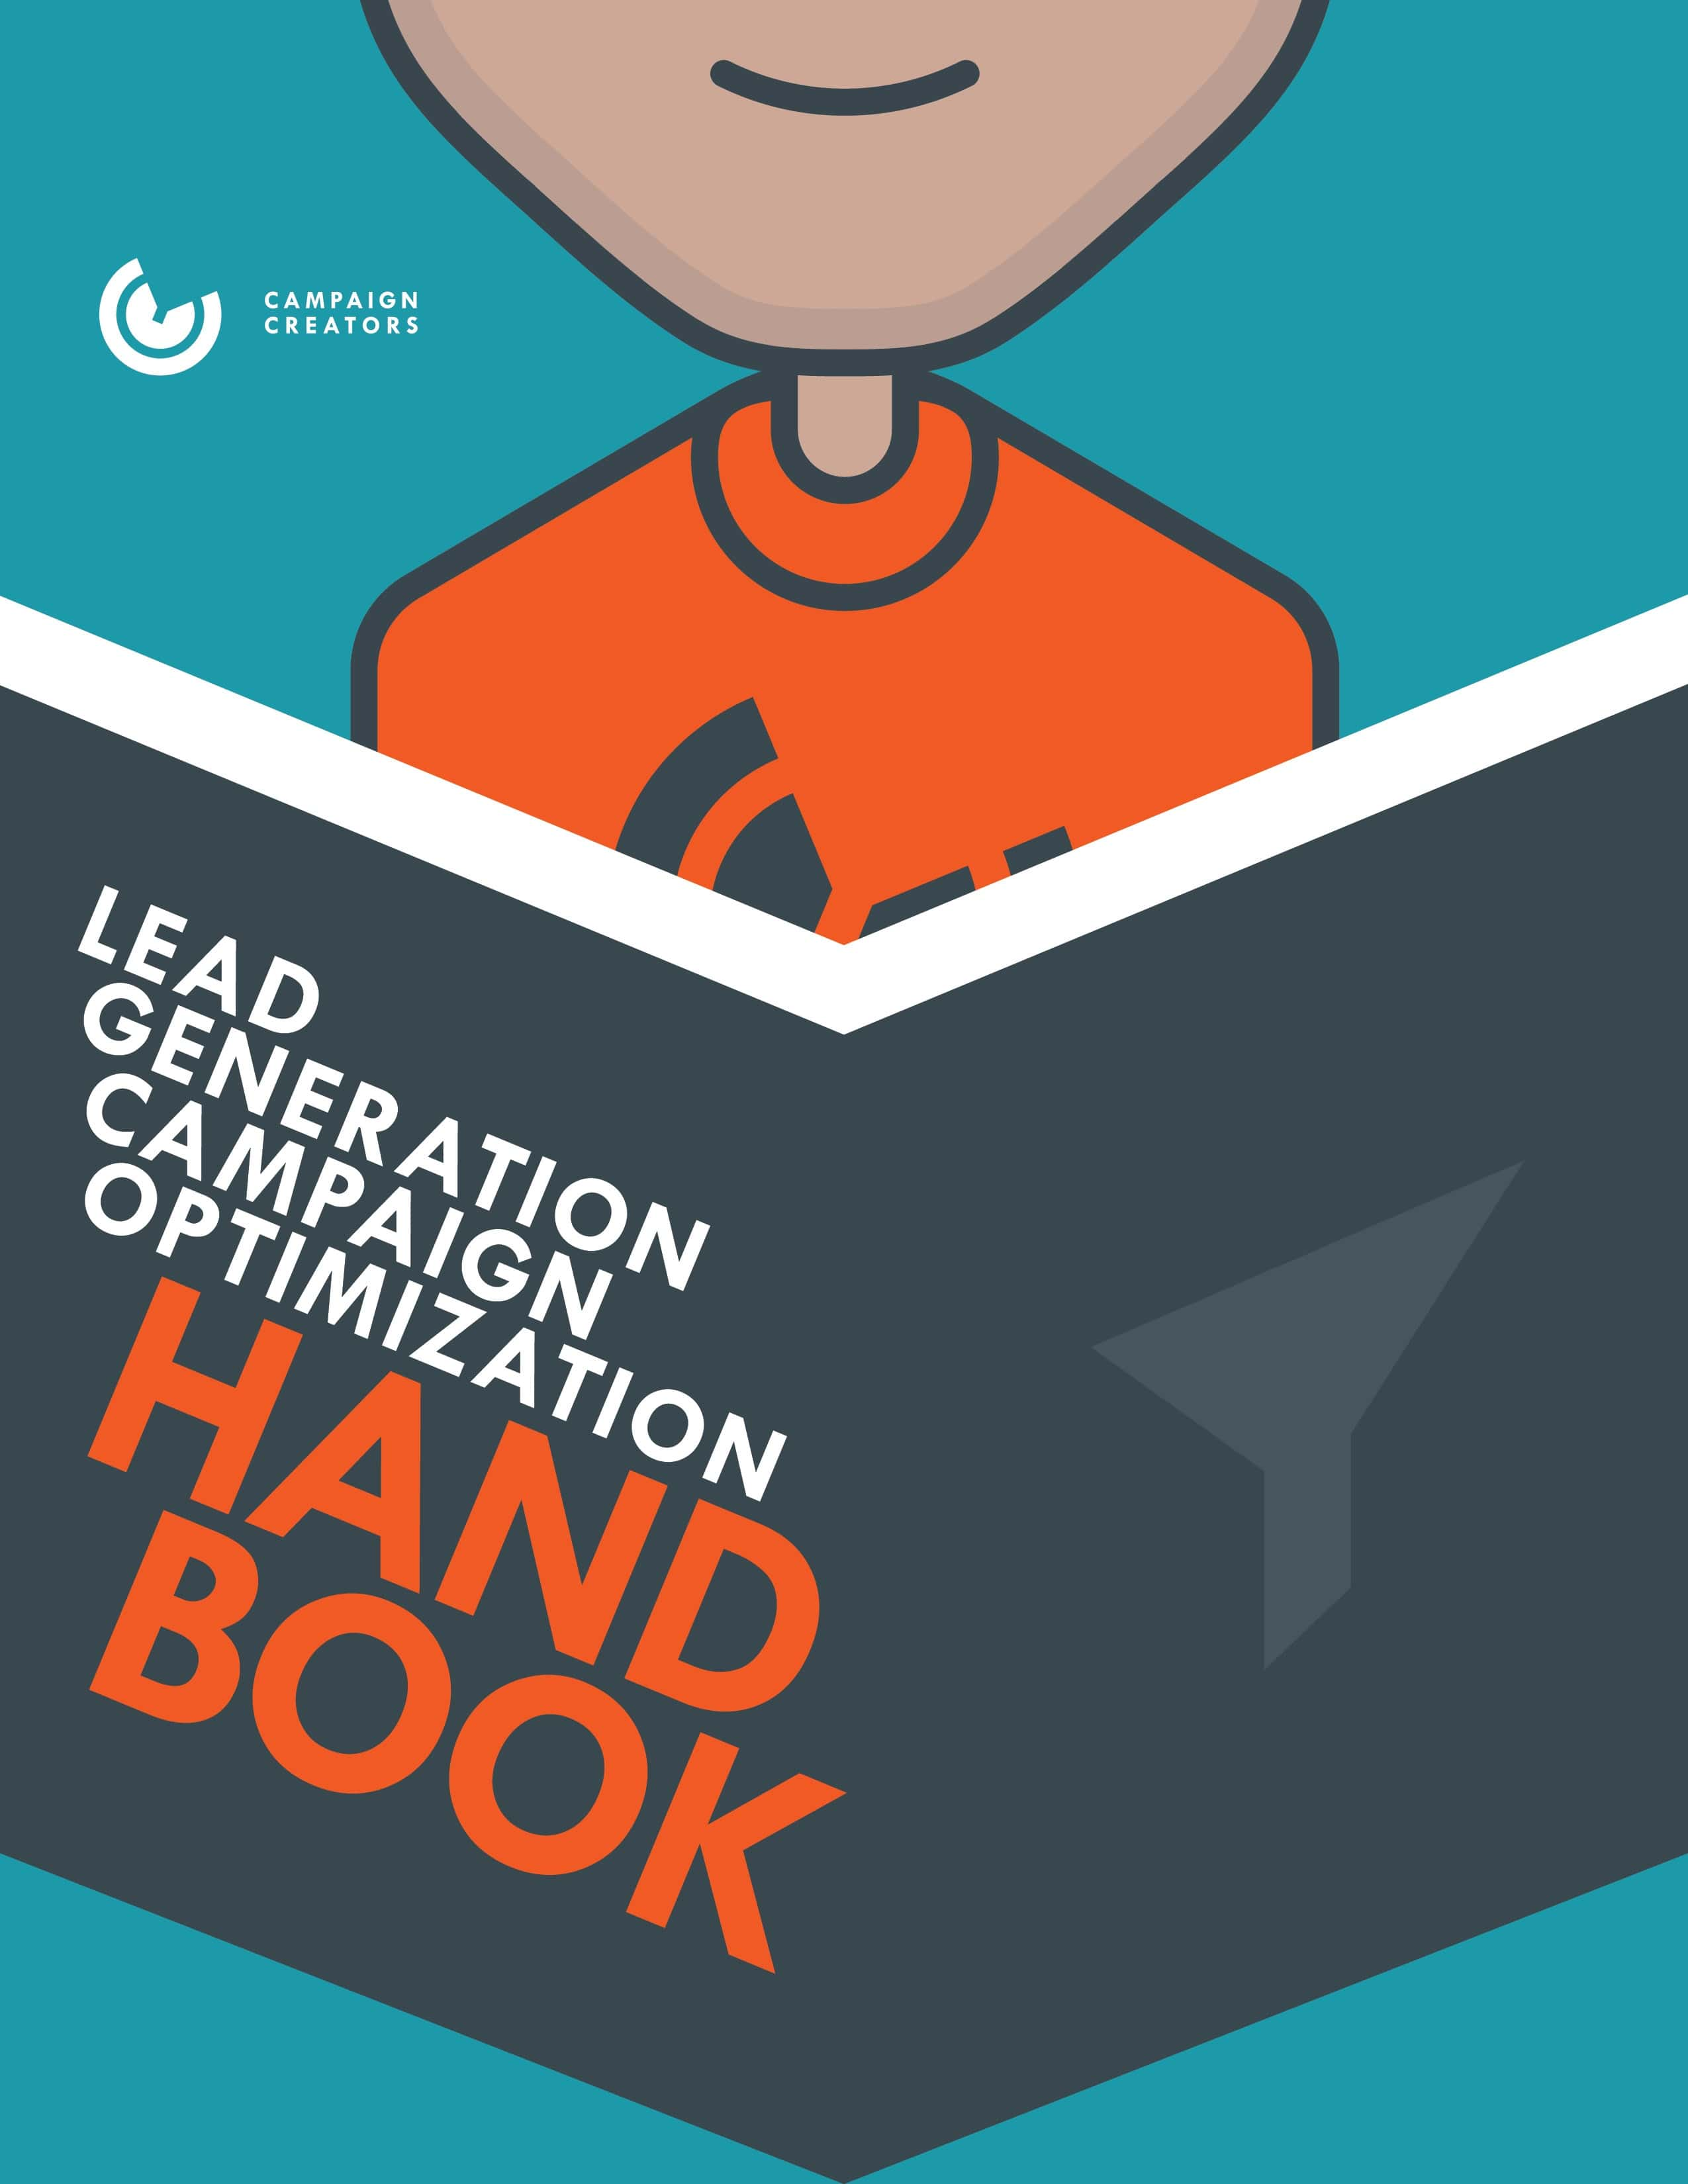 Campaign Optimization Handbook